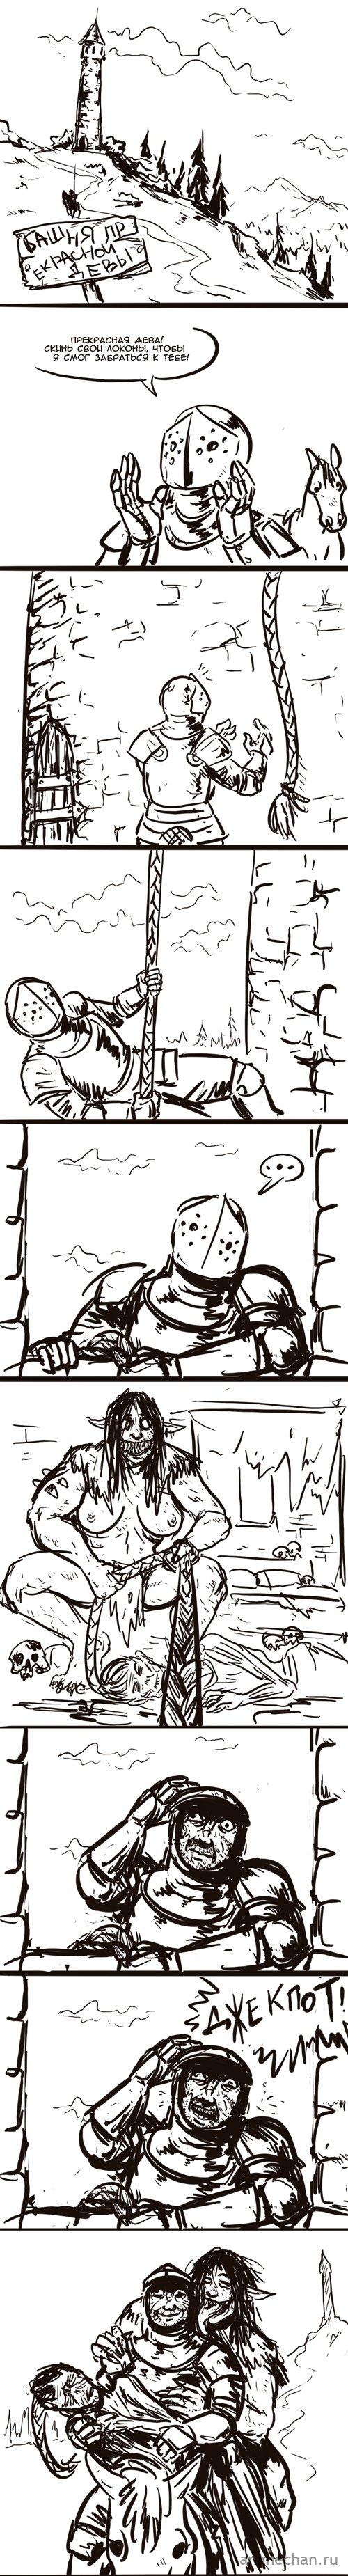 Удачливый рыцарь